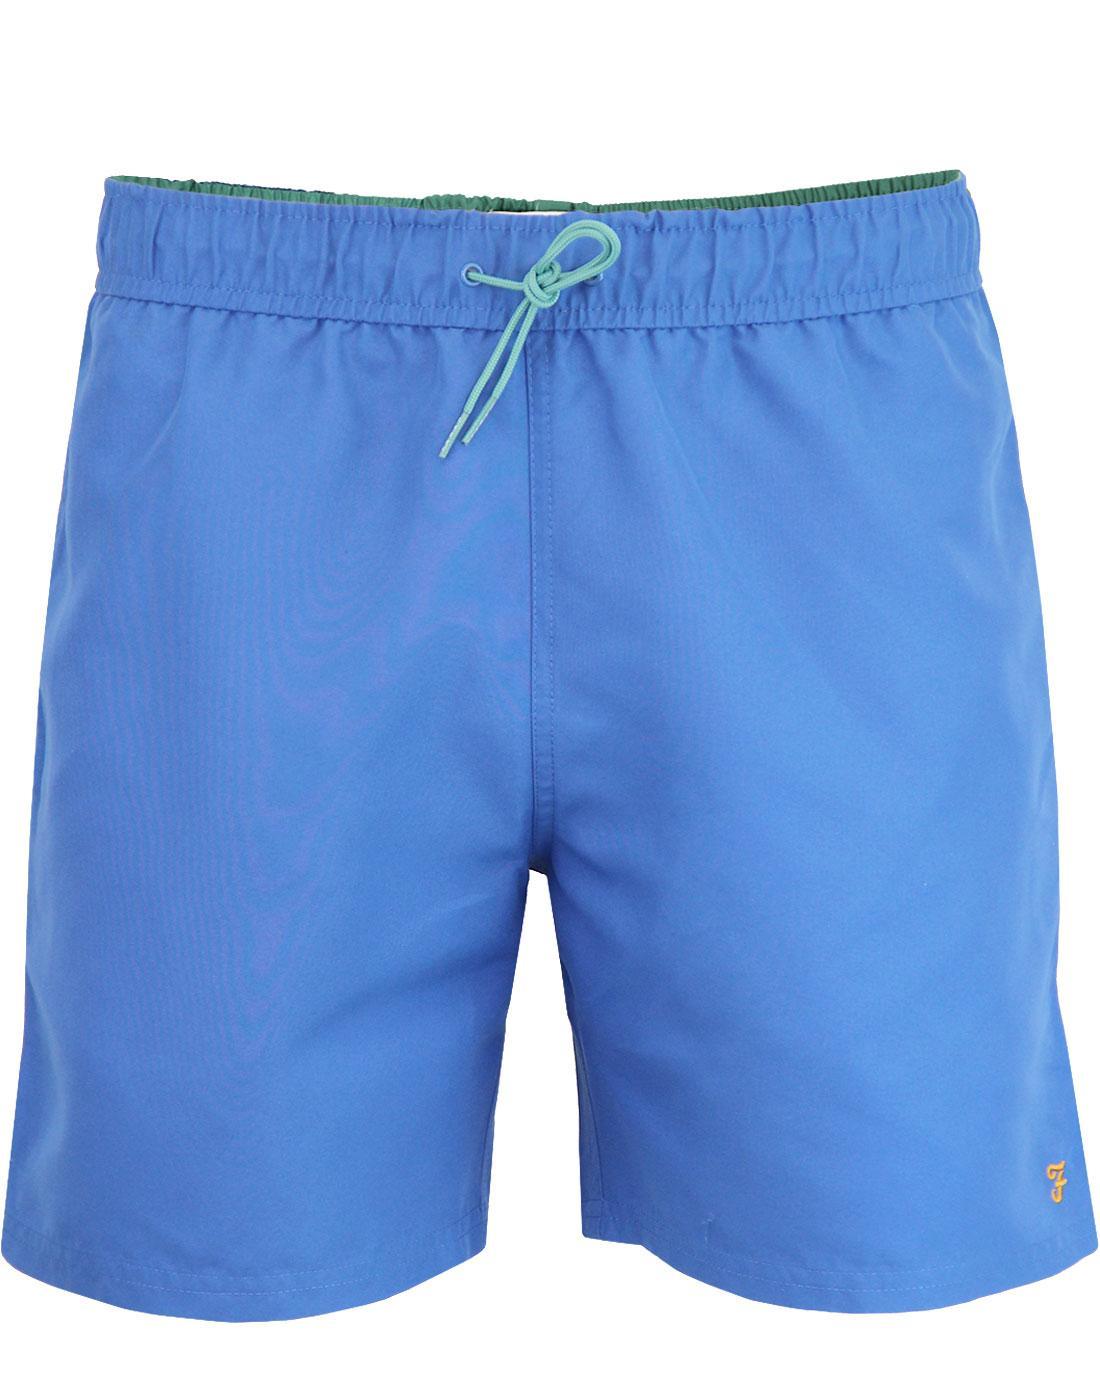 Colbert FARAH Retro Contrast Trim Swim Shorts BLUE